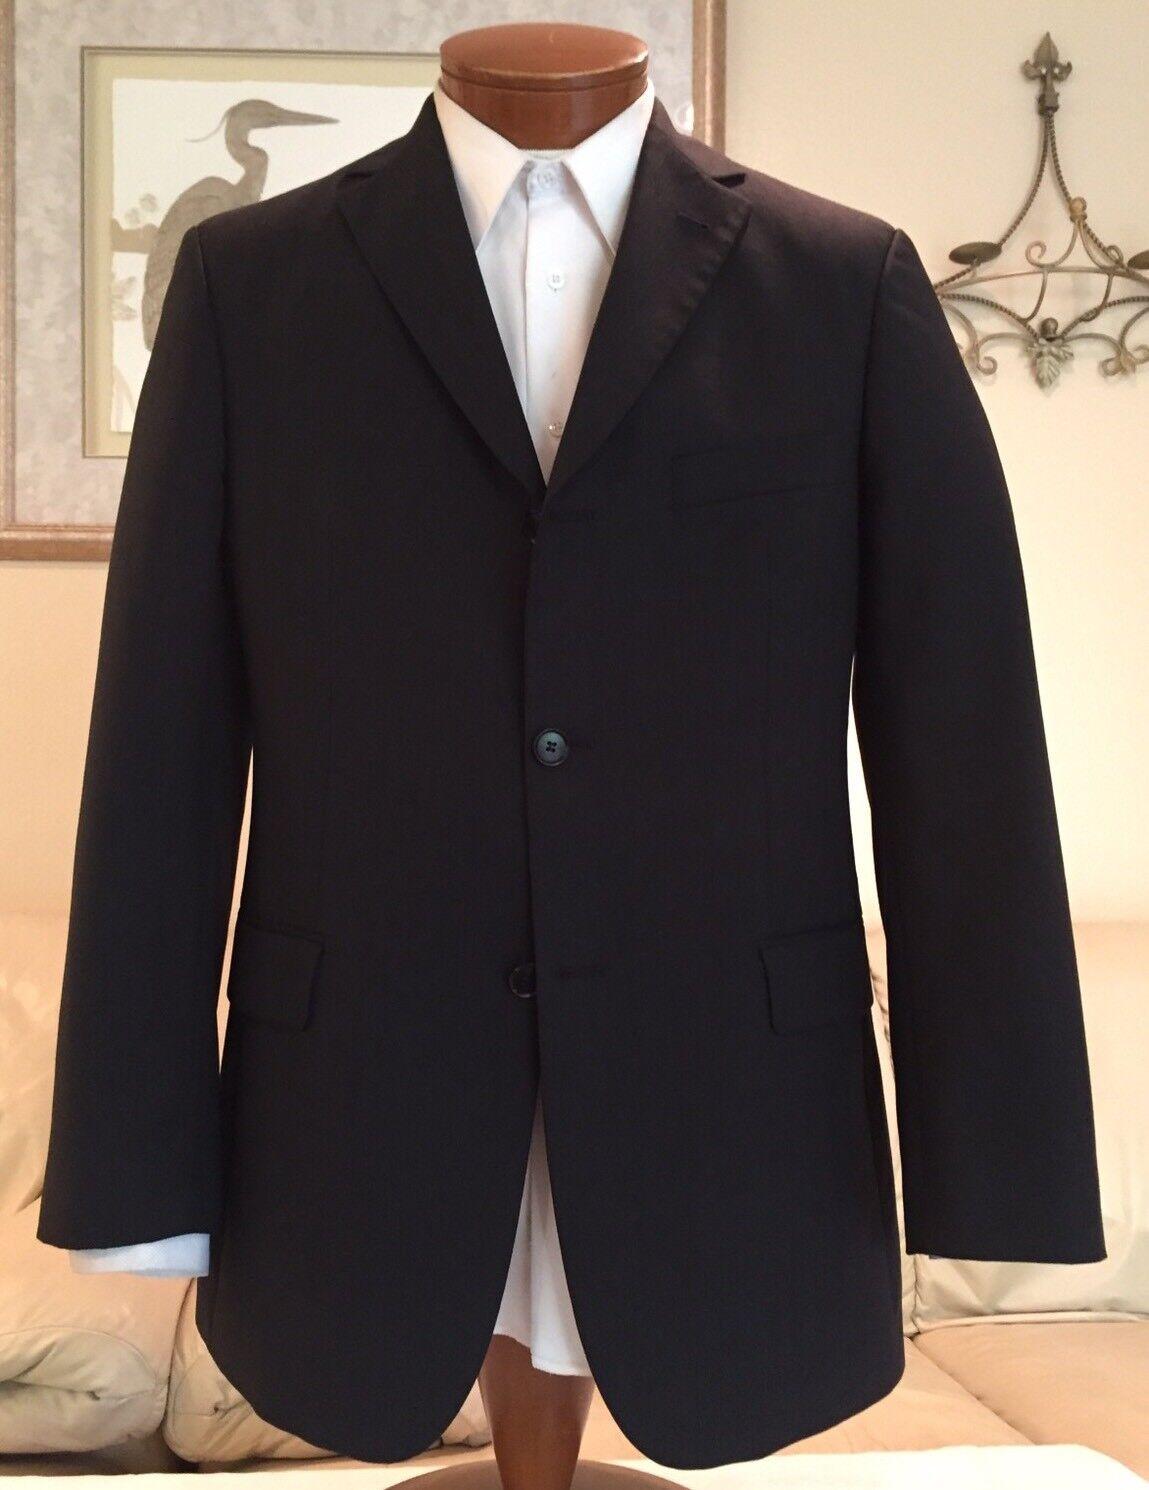 Hugo Boss Uomo Gris 3 100s 3 Gris Btn Flat Front Wool Suit Sz 36 R MINT  9ef6f8